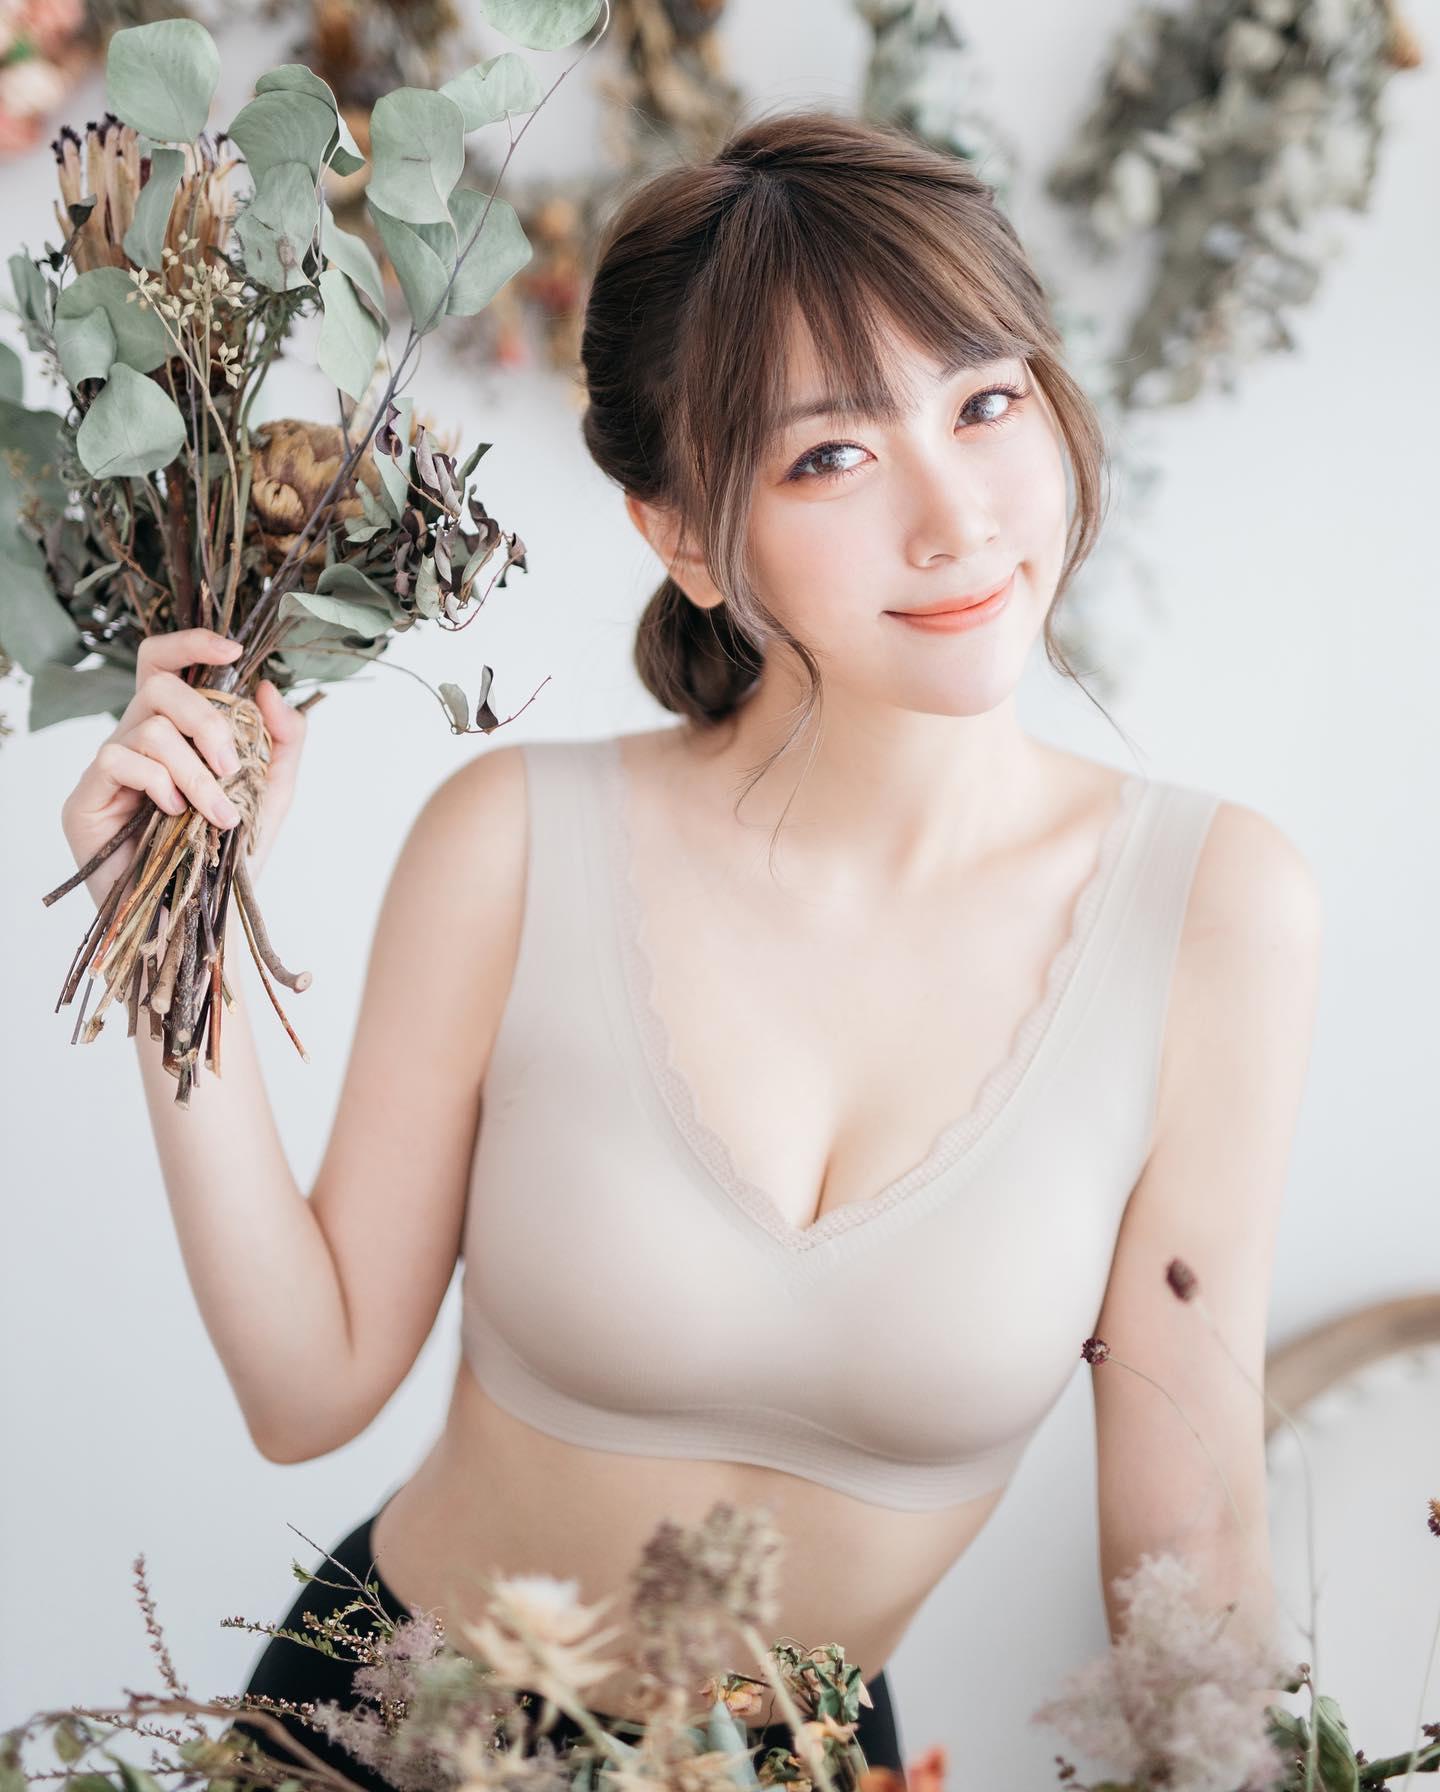 Rose_Ma_j_photo_6.jpg